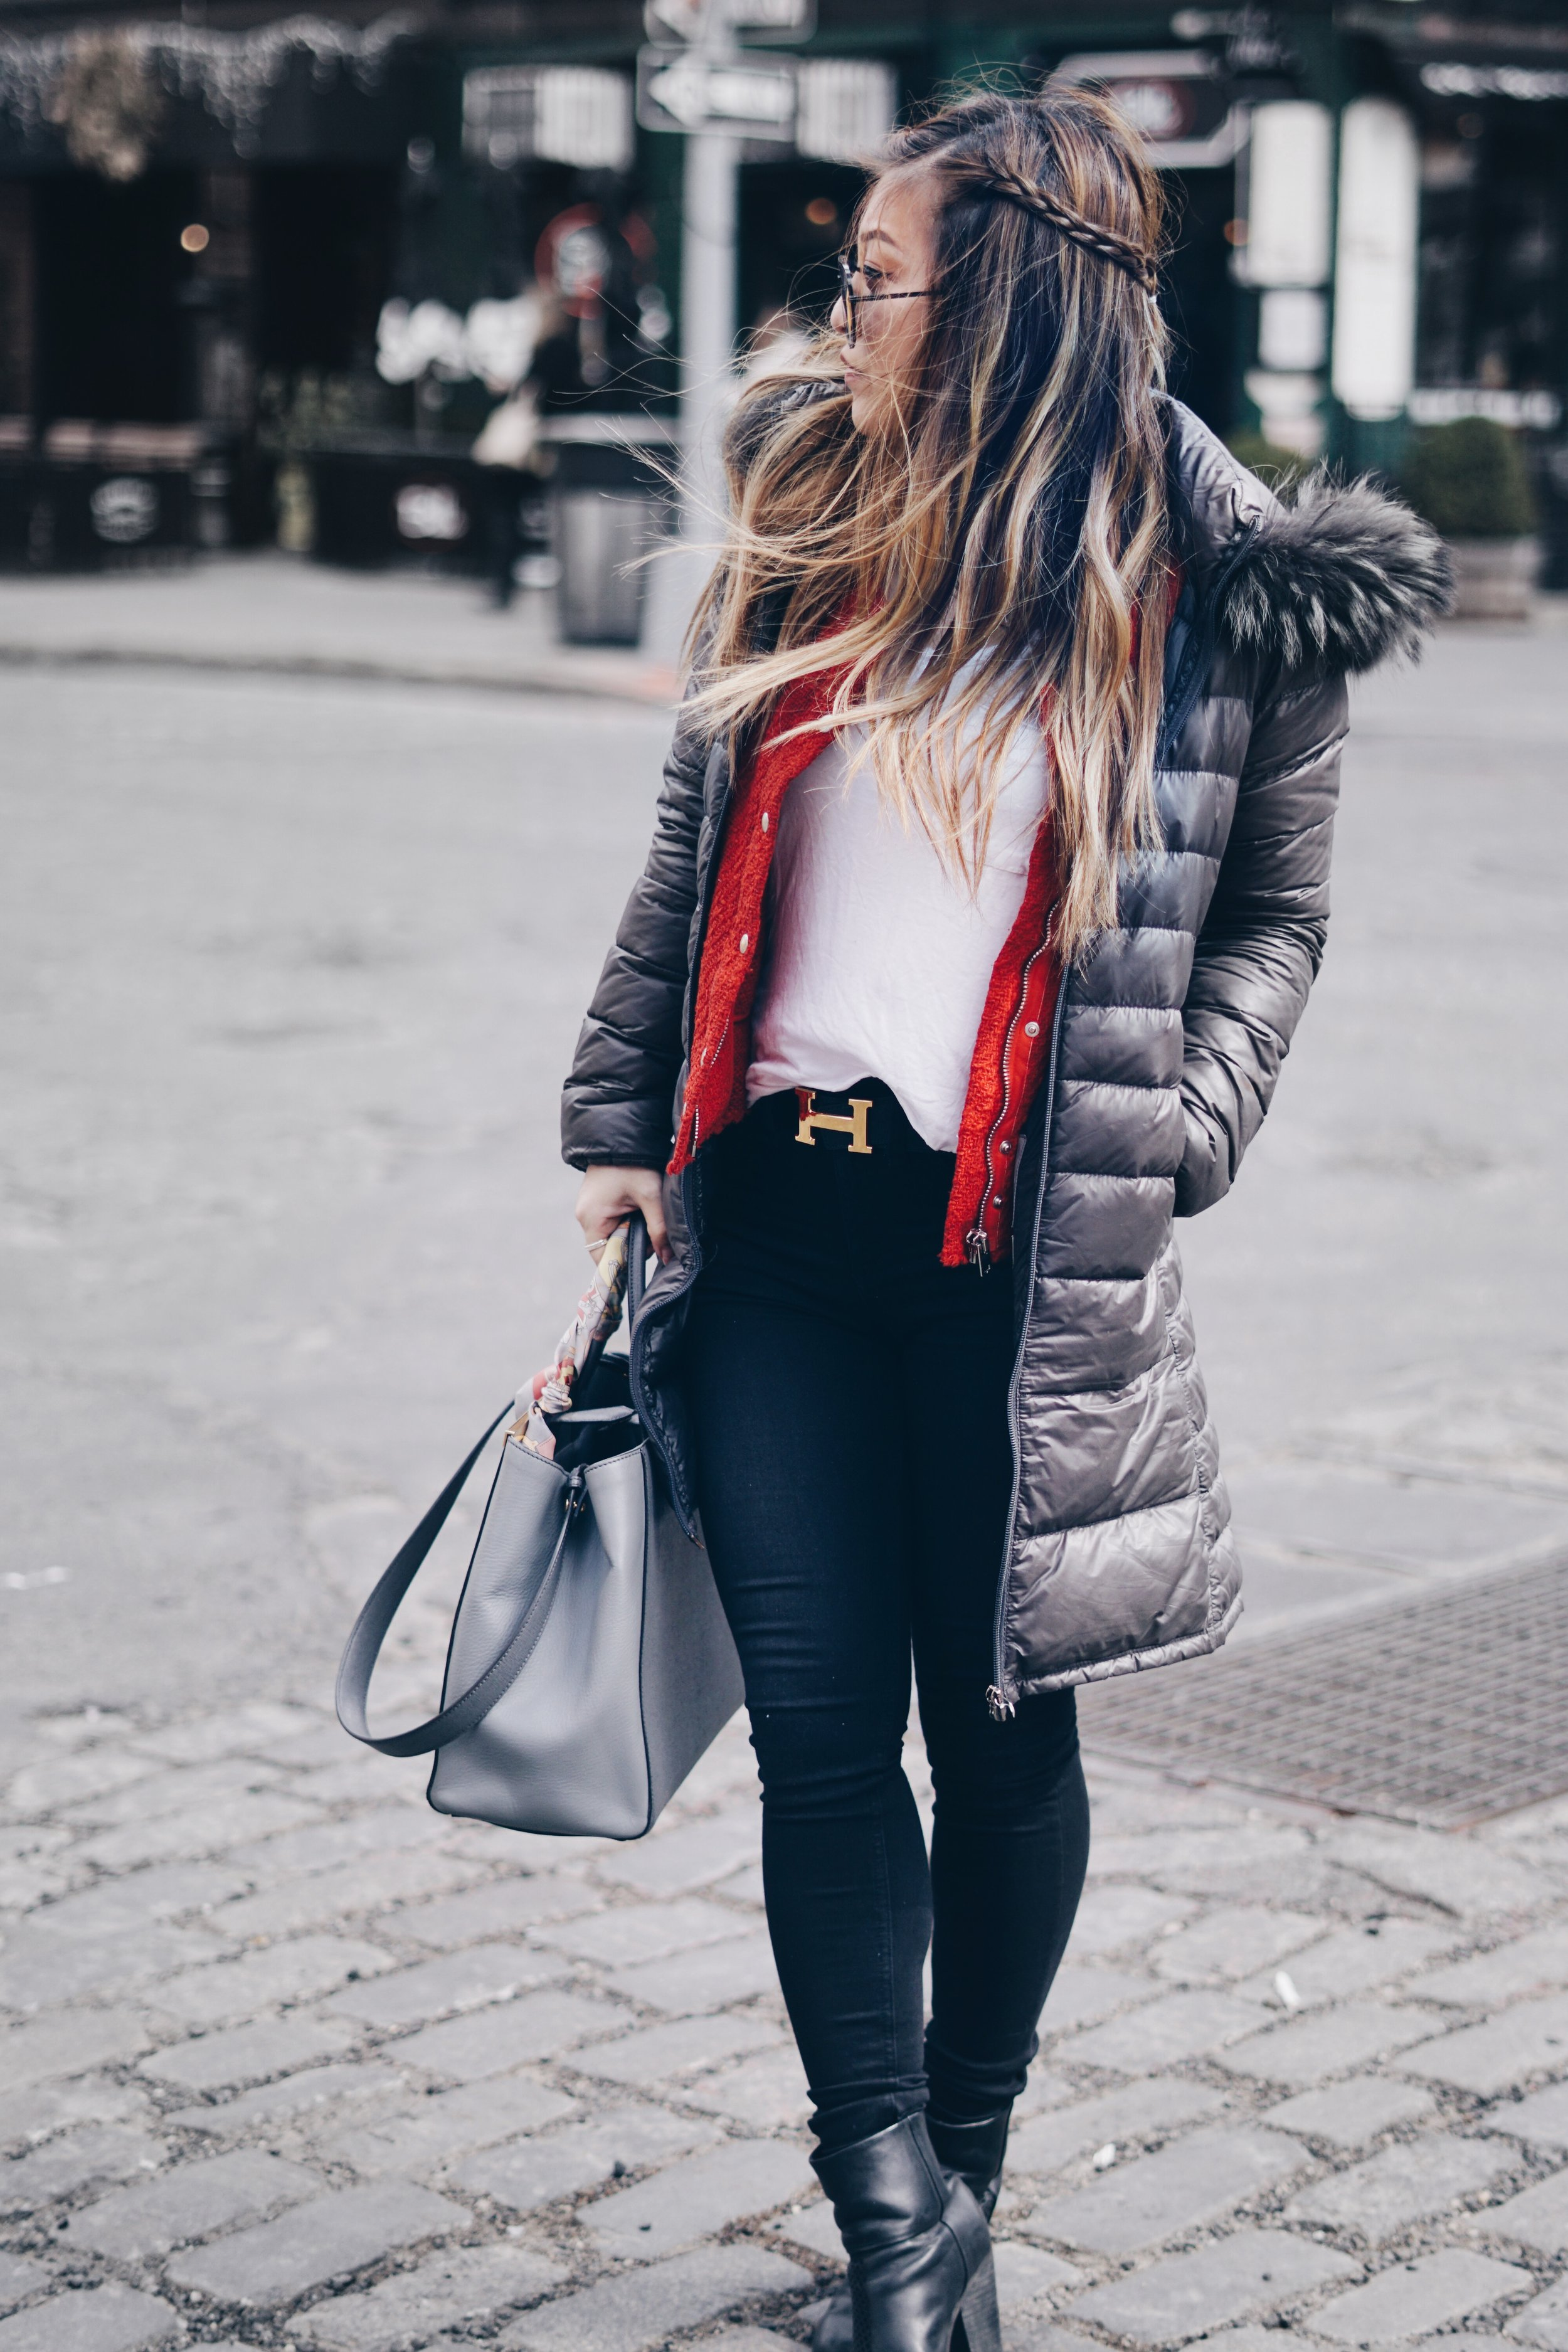 Down Jacket: Duvetica | Tweed Jacket:  IRO | Shirt: H&M |Jeans: Rag & Bone | Booties: Rag & Bone | Purse: Fendi | Sunglasses: Quay Australia | Belt:  Hermes